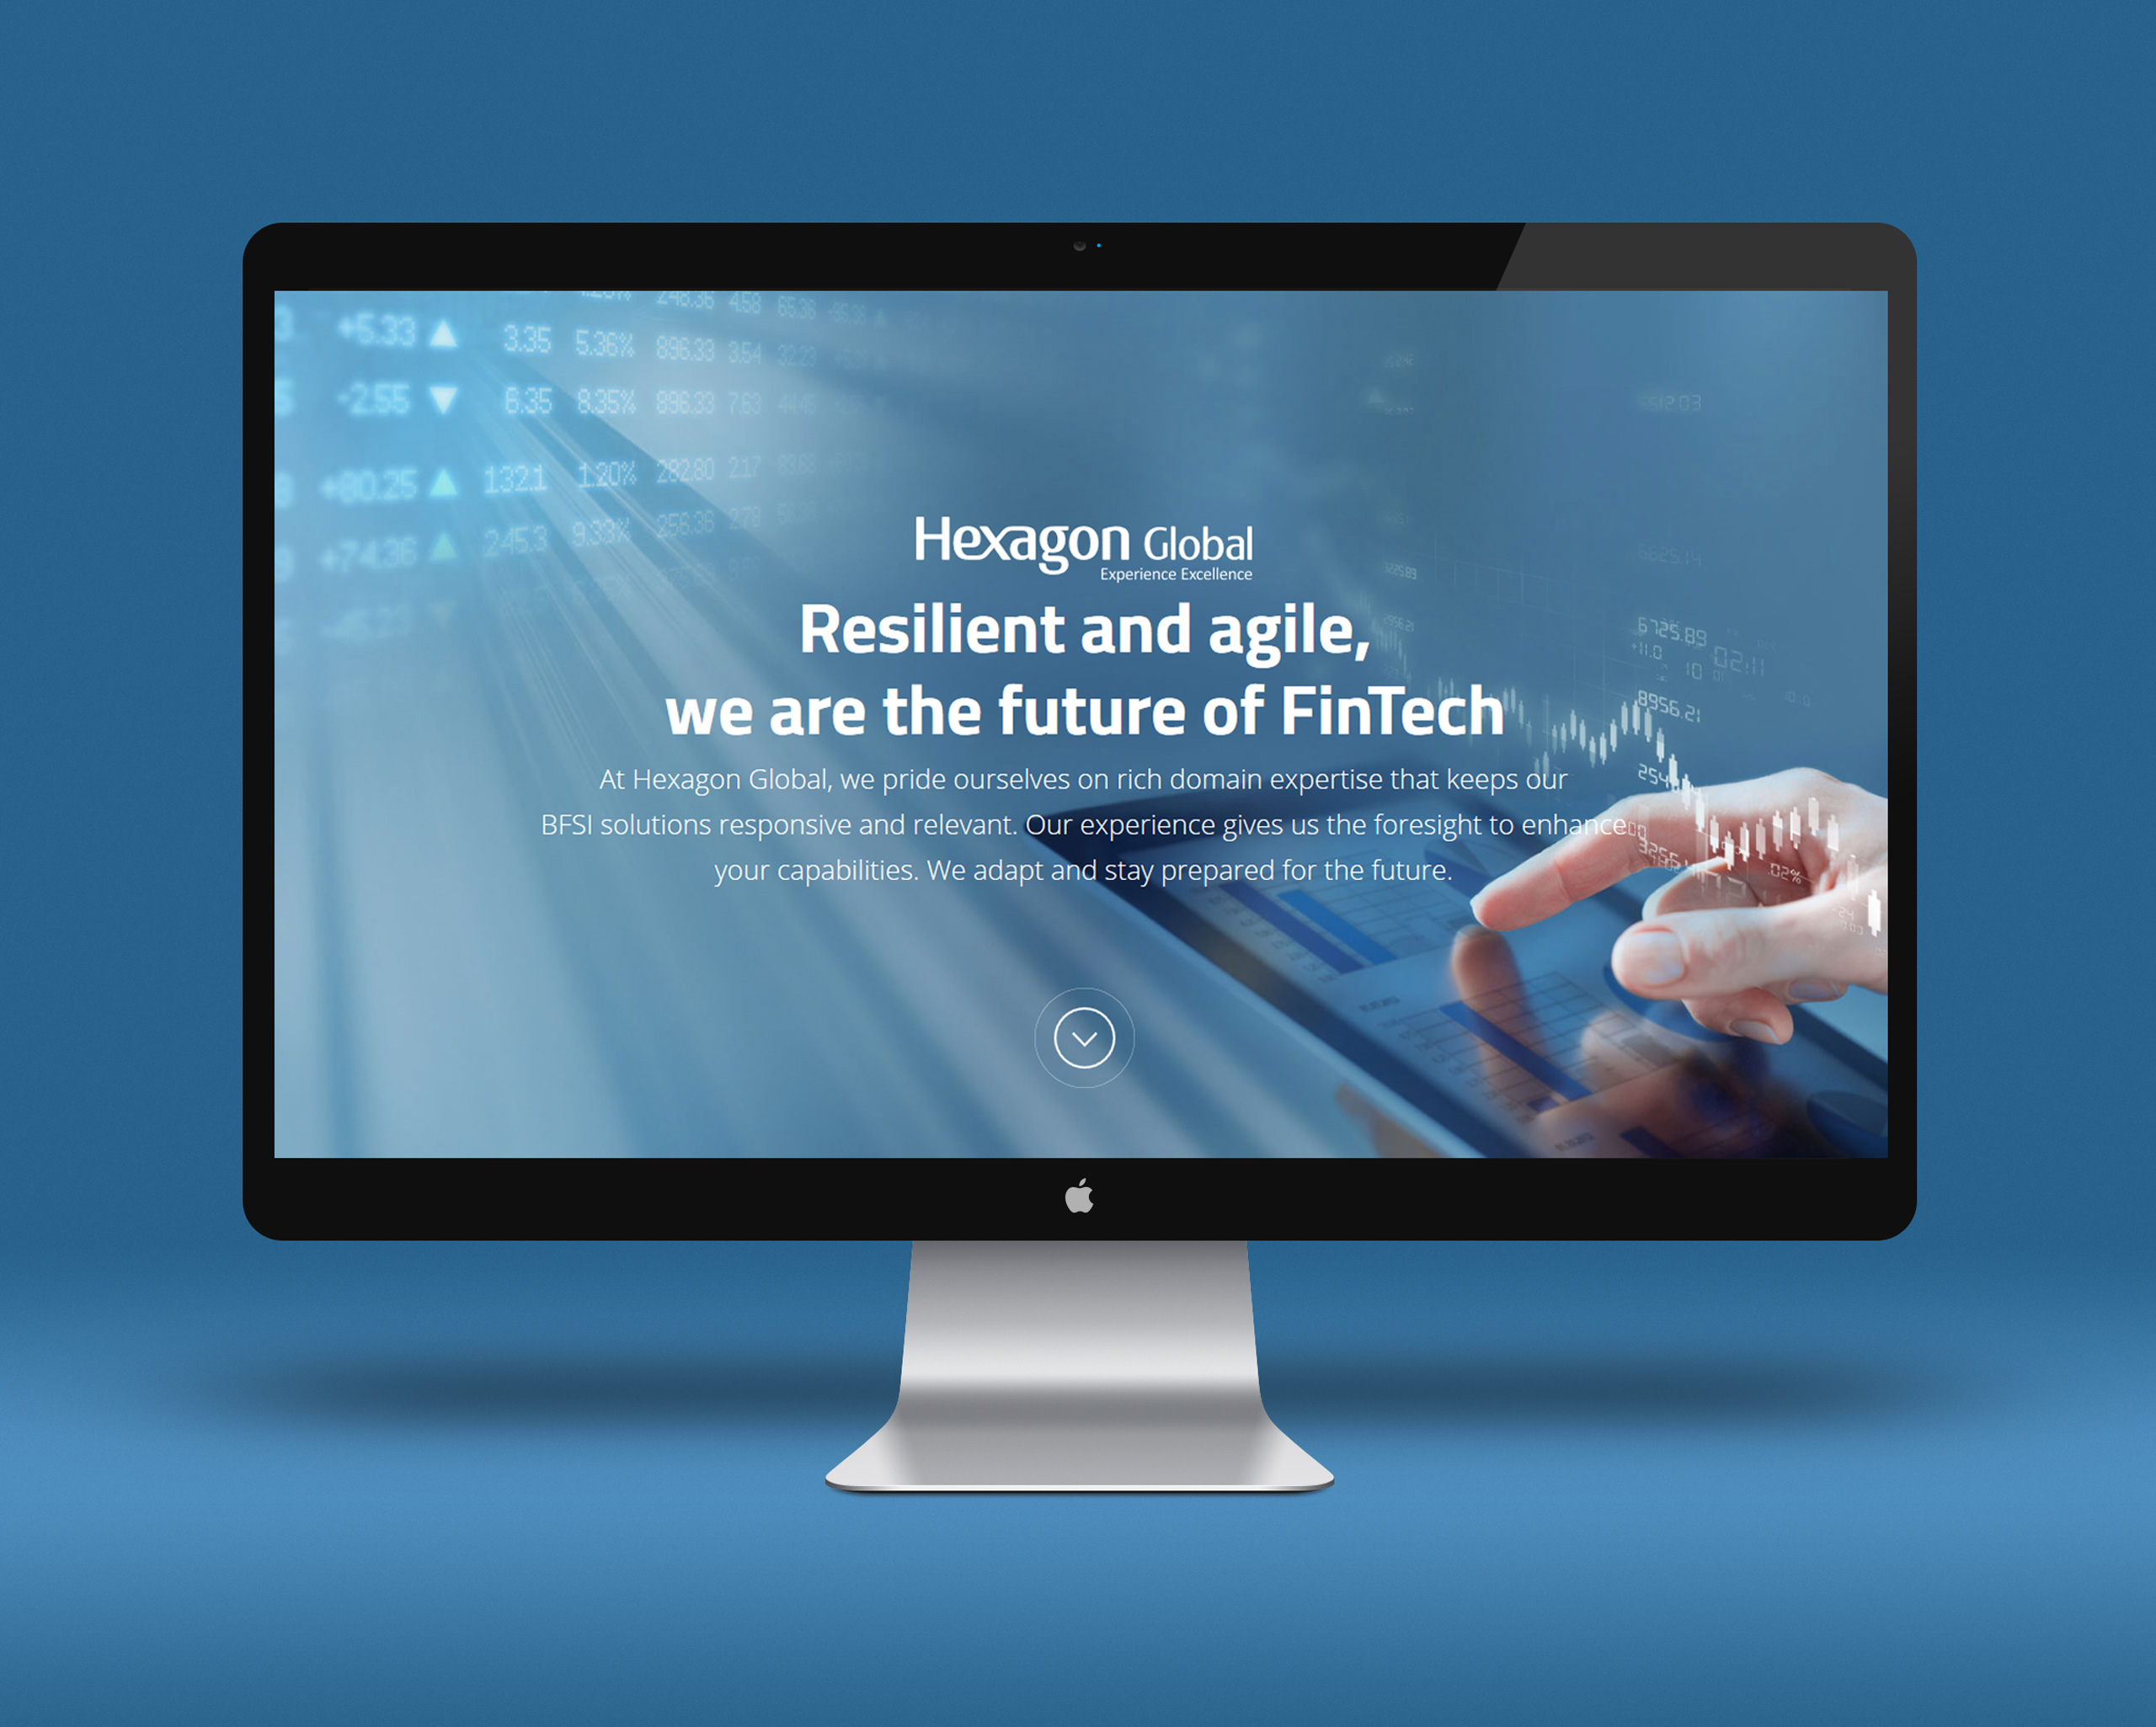 Home screen design for fintech company Hexagon Global